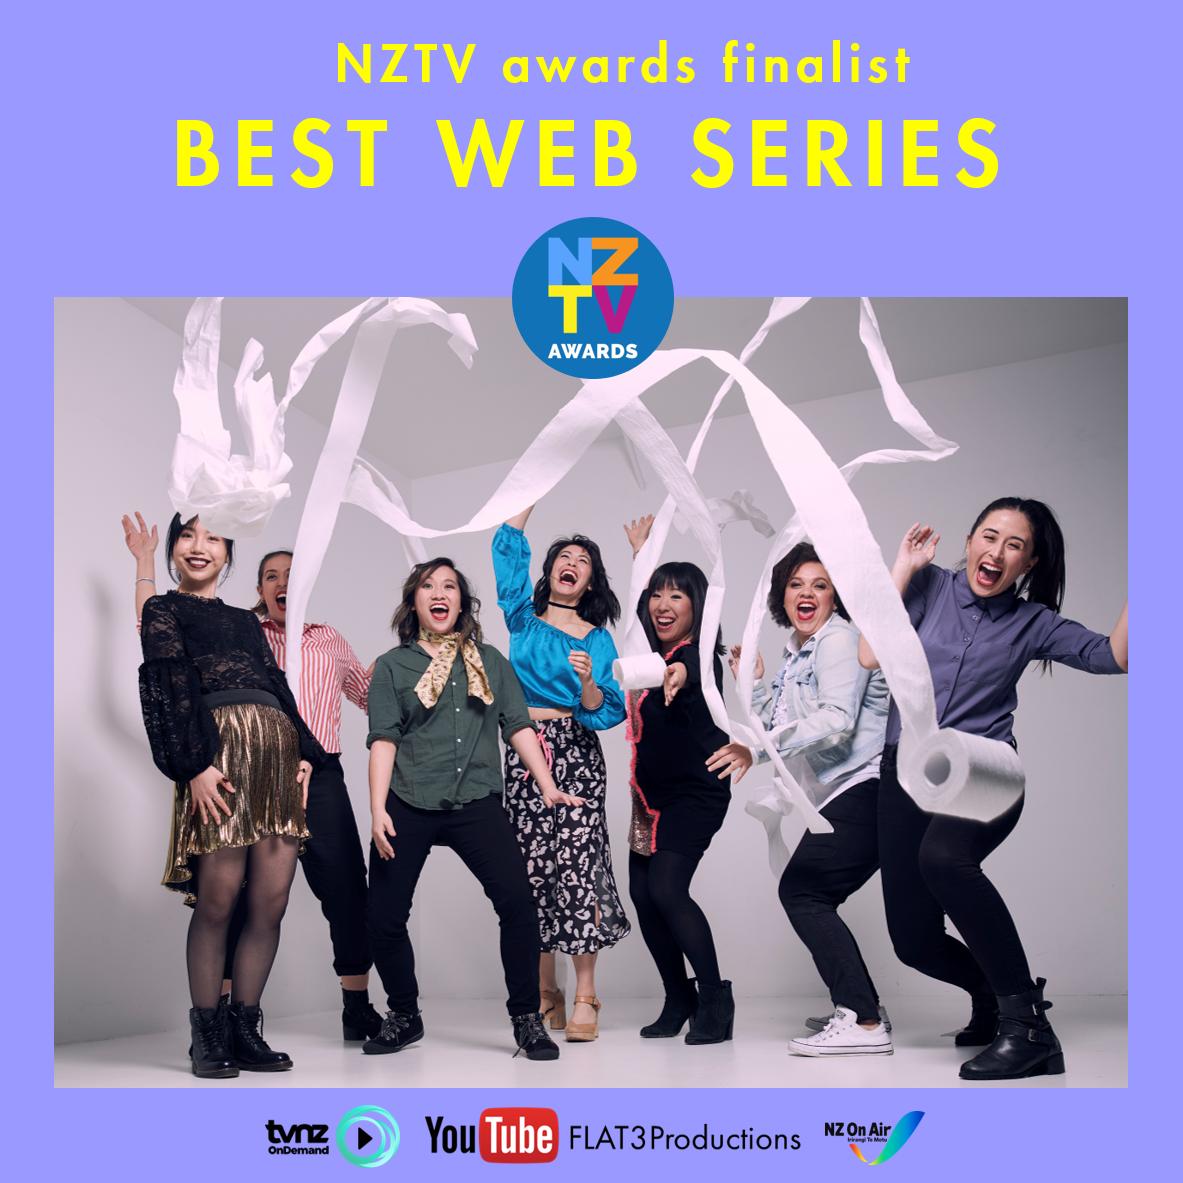 NZTV Awards Finalist, 2018